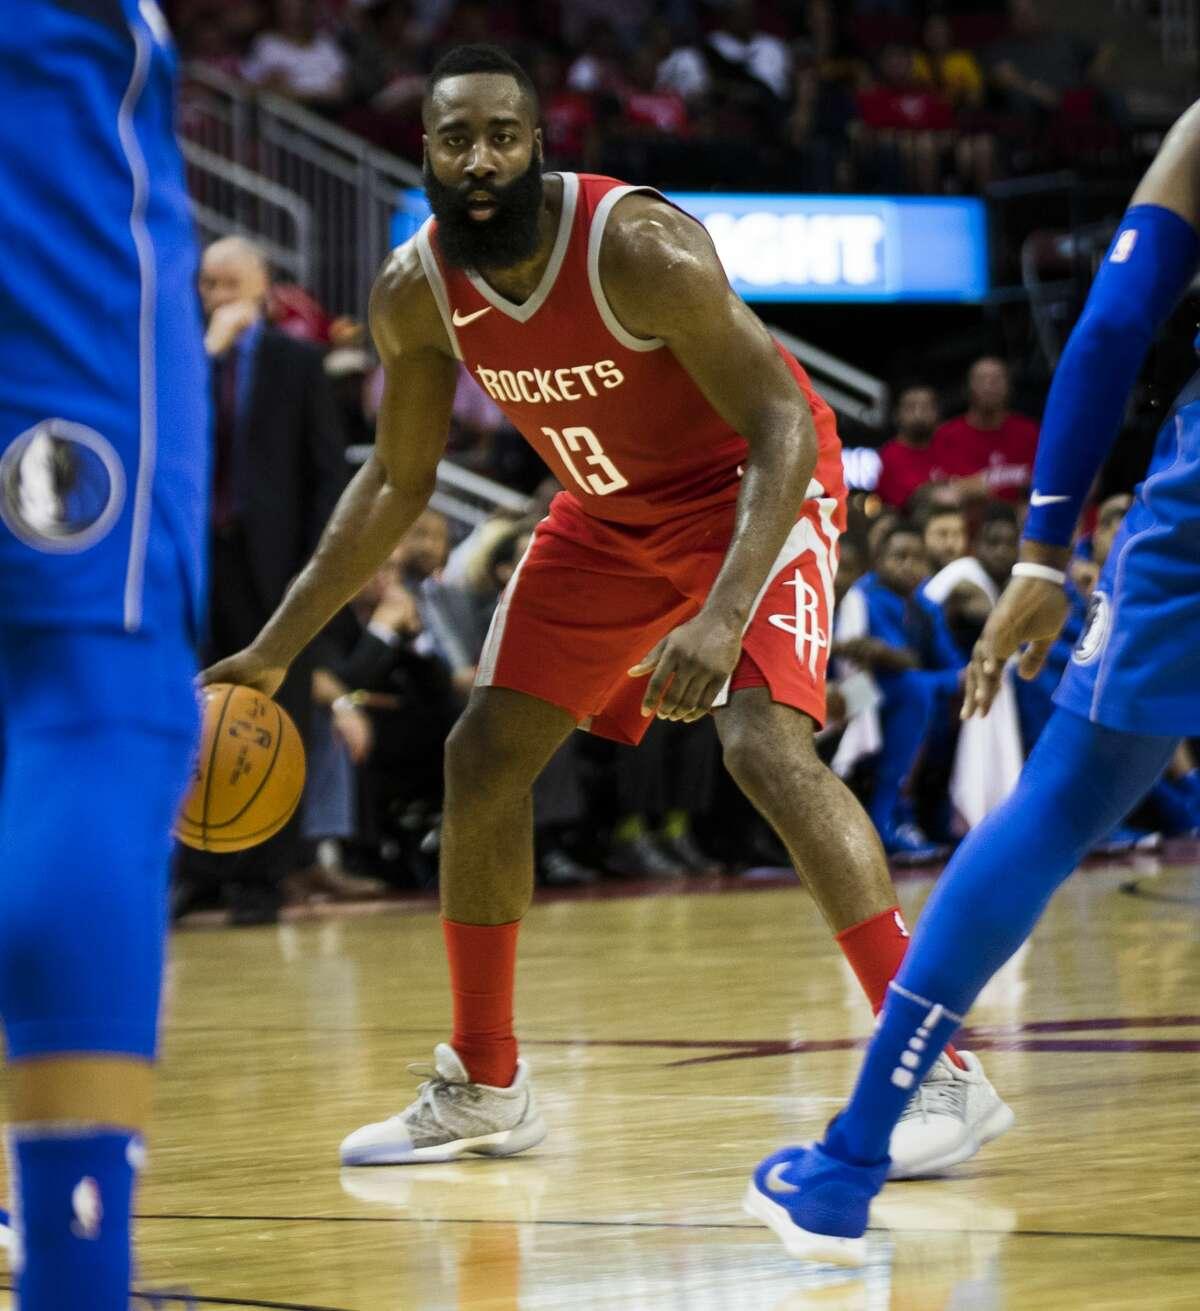 Oct. 21: Rockets 107, Mavericks 91 Point leaders Rockets: James Harden (29) Mavericks: J.J. Barea & Yogi Ferrell (19) Record: 3-0